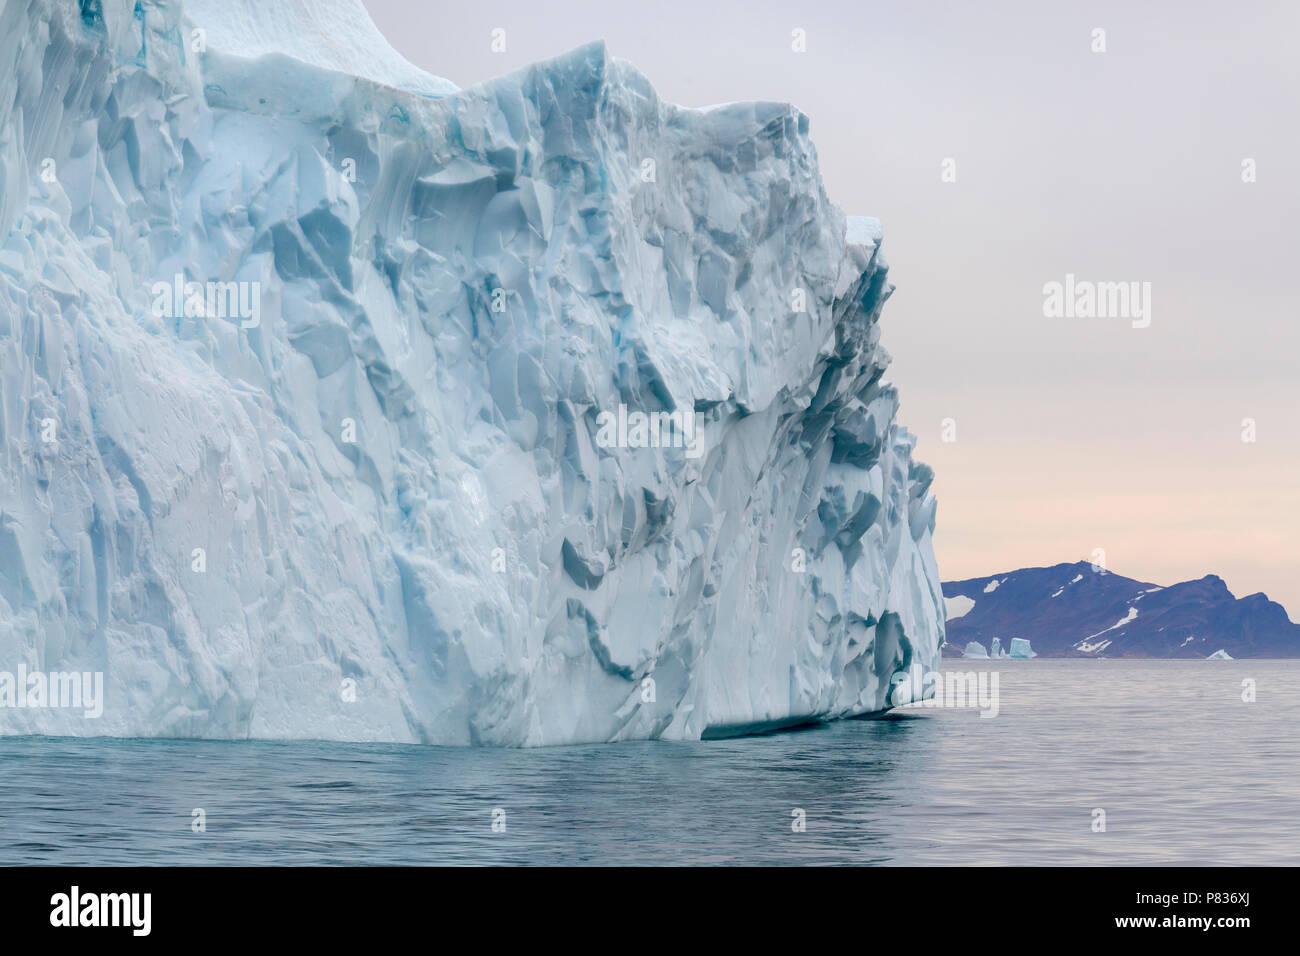 Greenlandic iceberg off the coast of Eastern Greenland - Stock Image